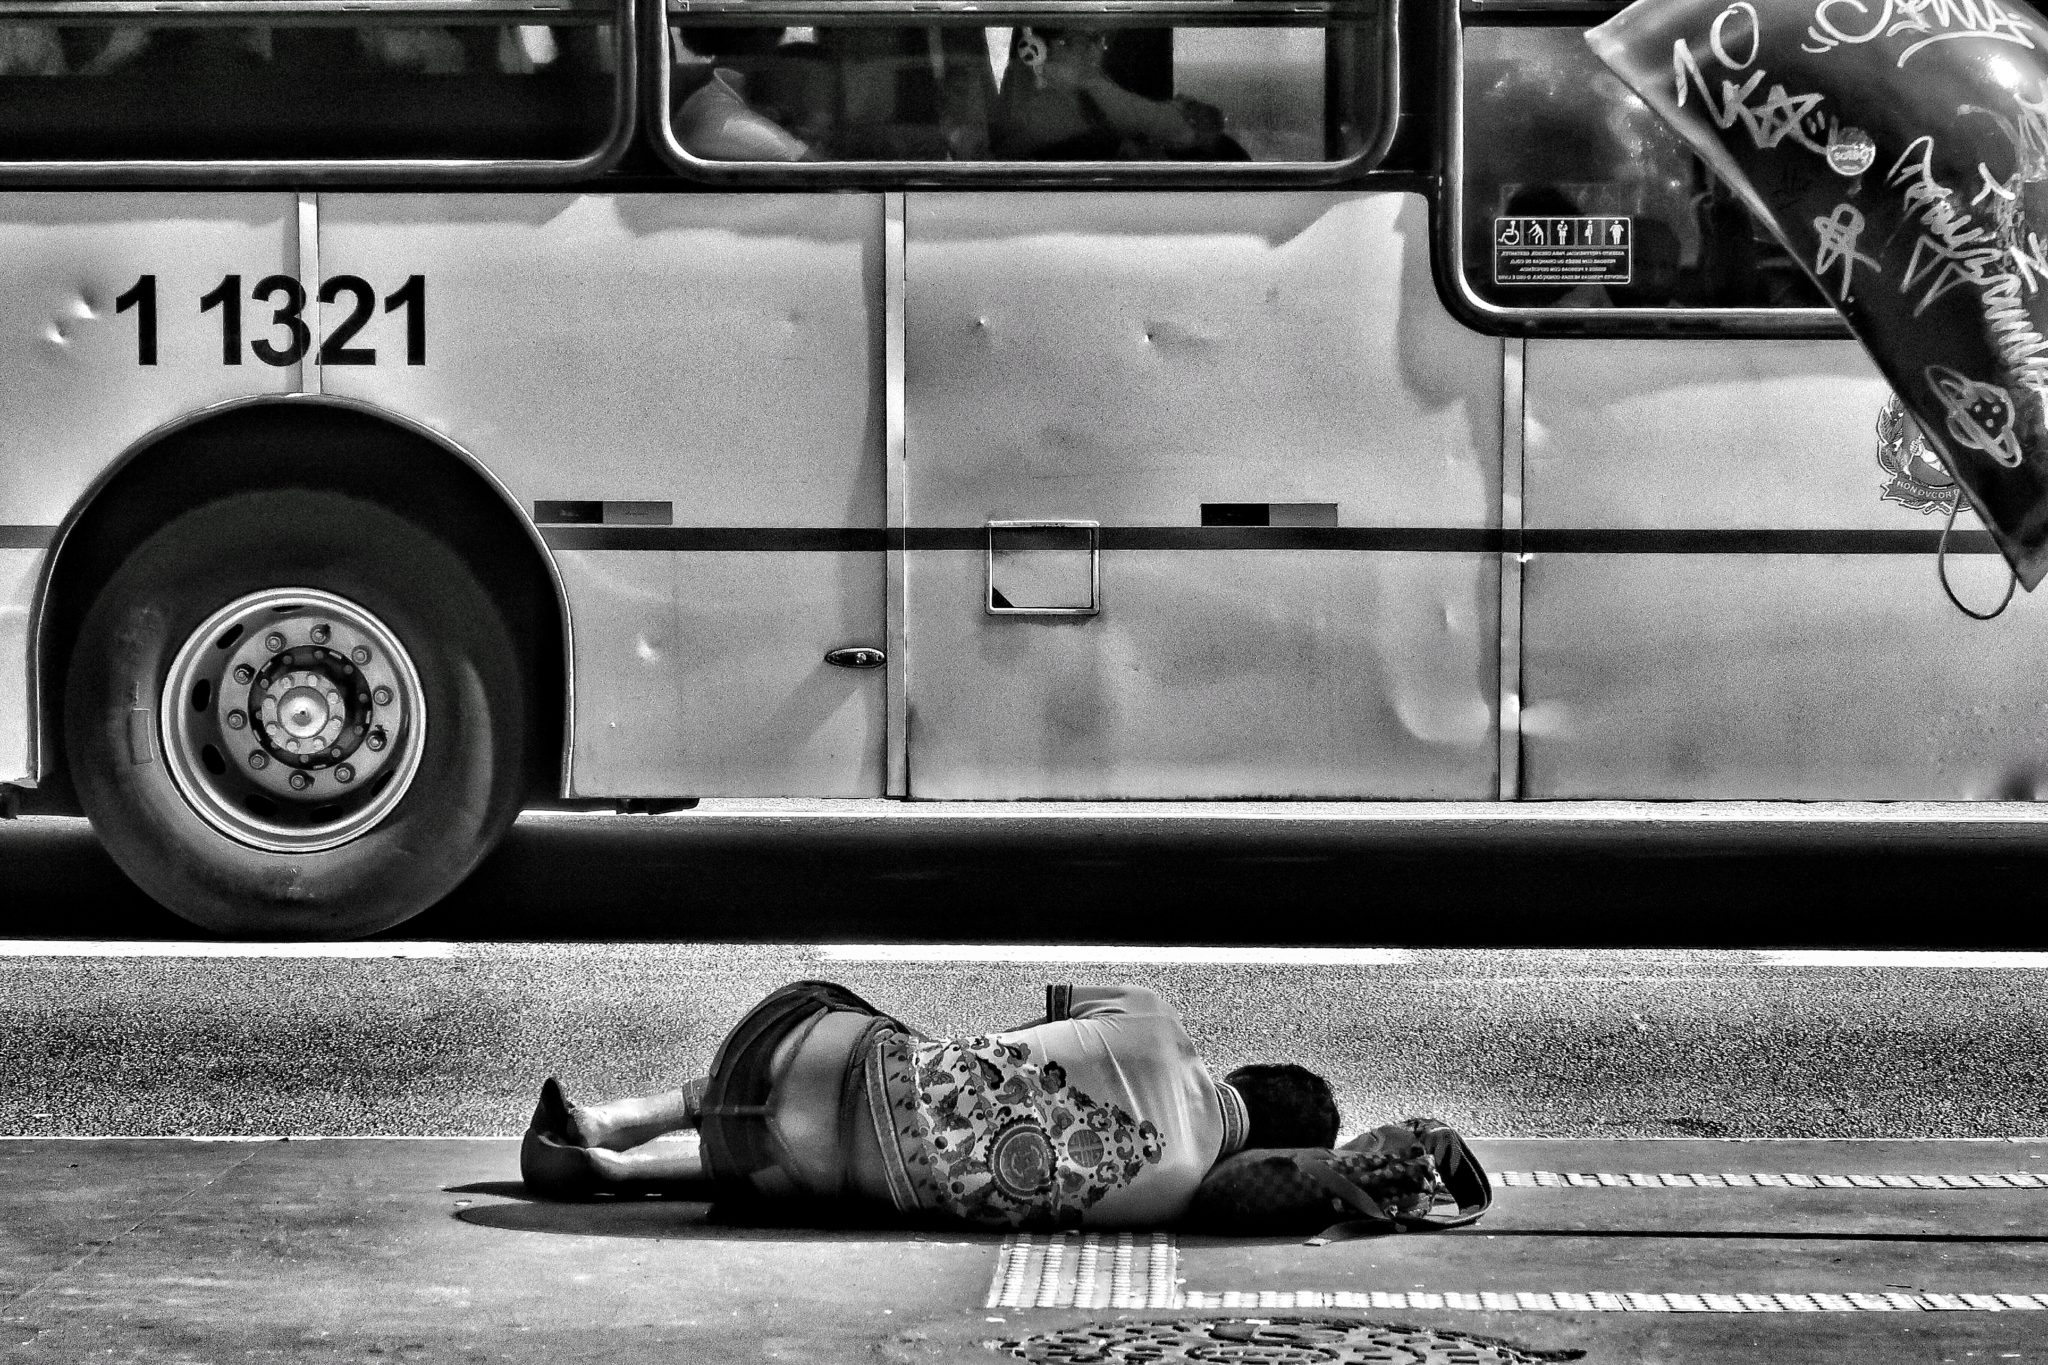 Brazil's inequality